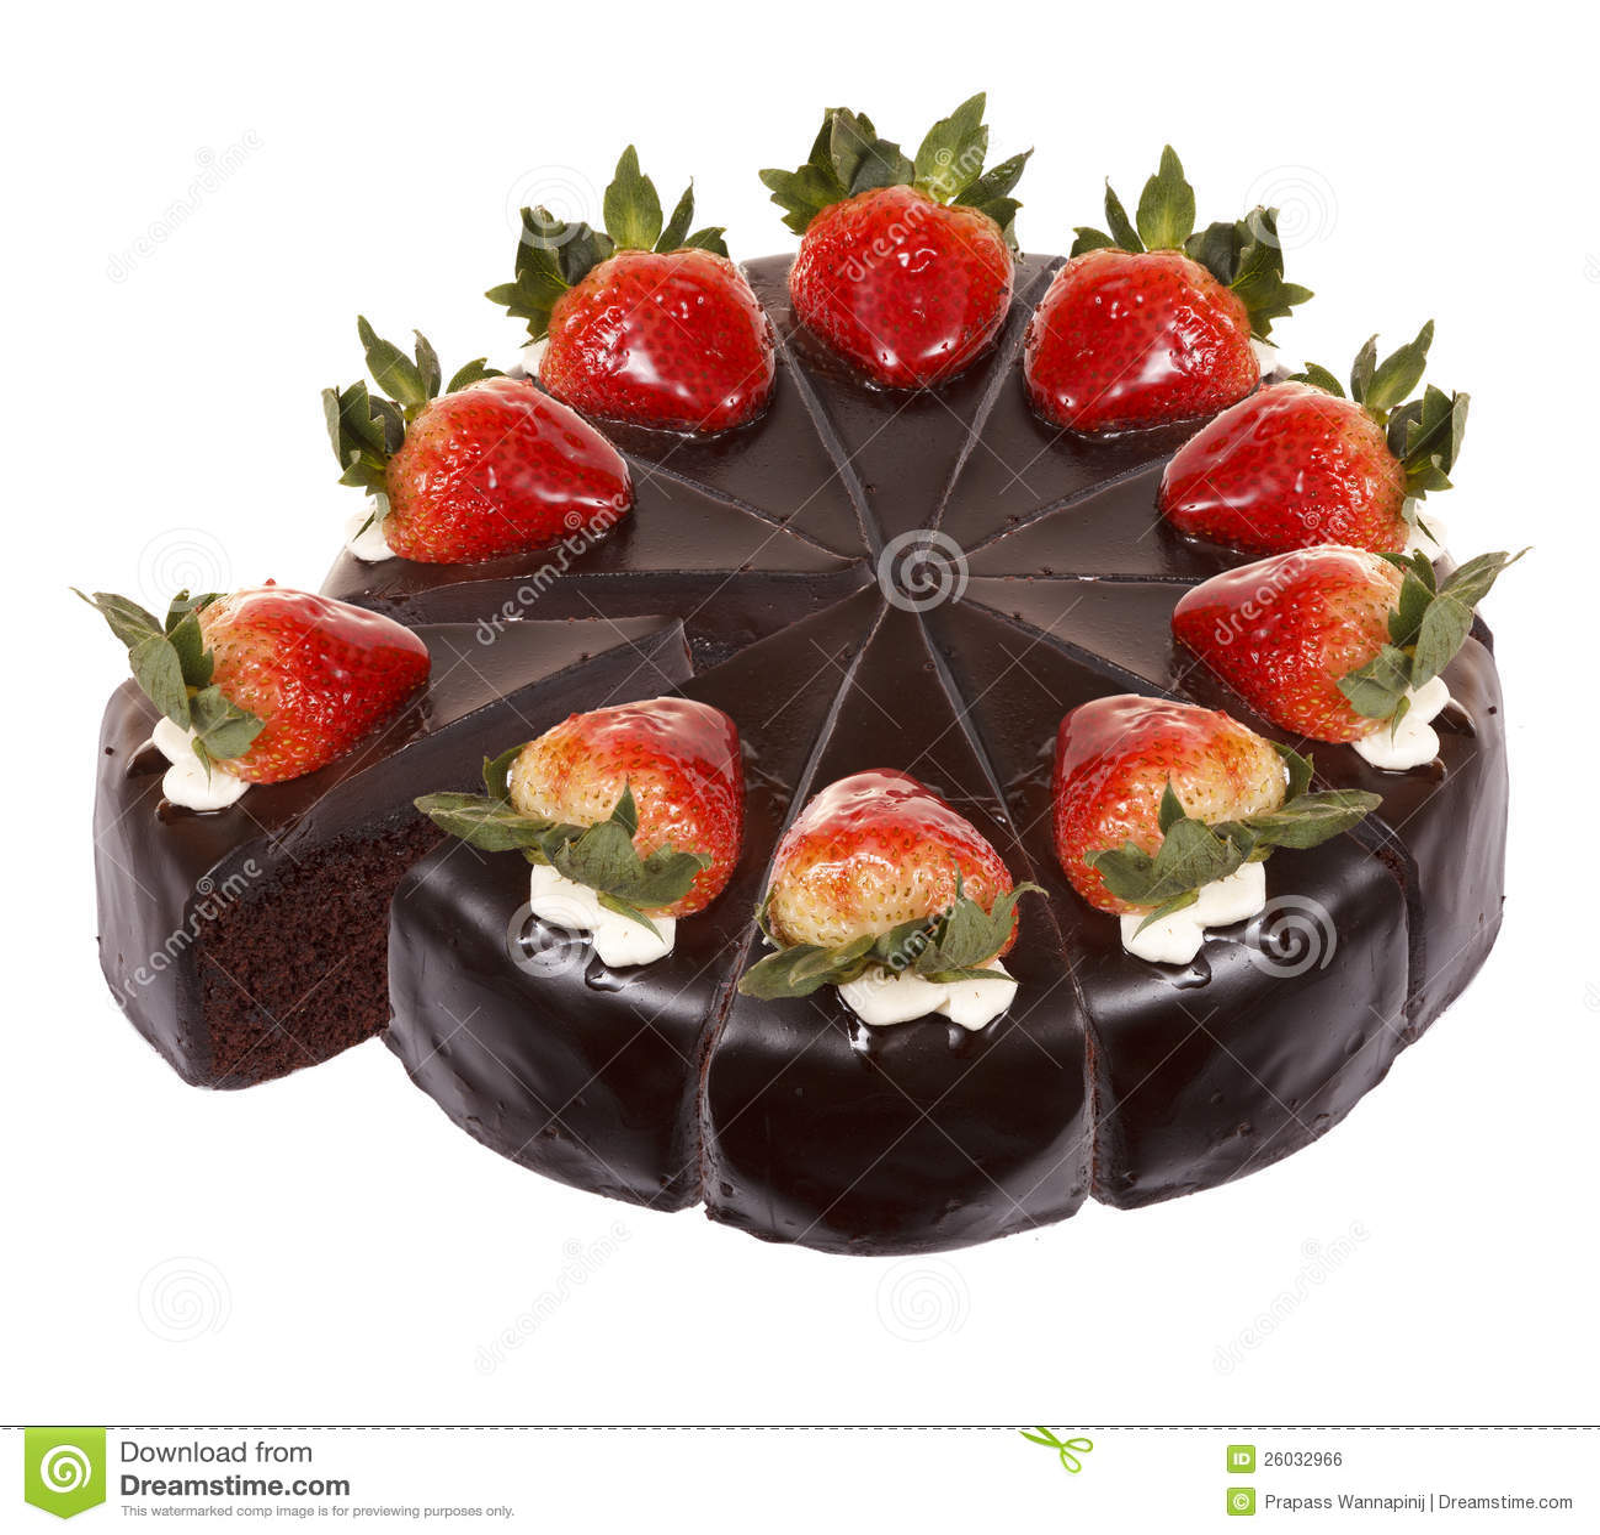 Dark Chocolate Strawberry Cake Royalty Free Stock Image - Image ...